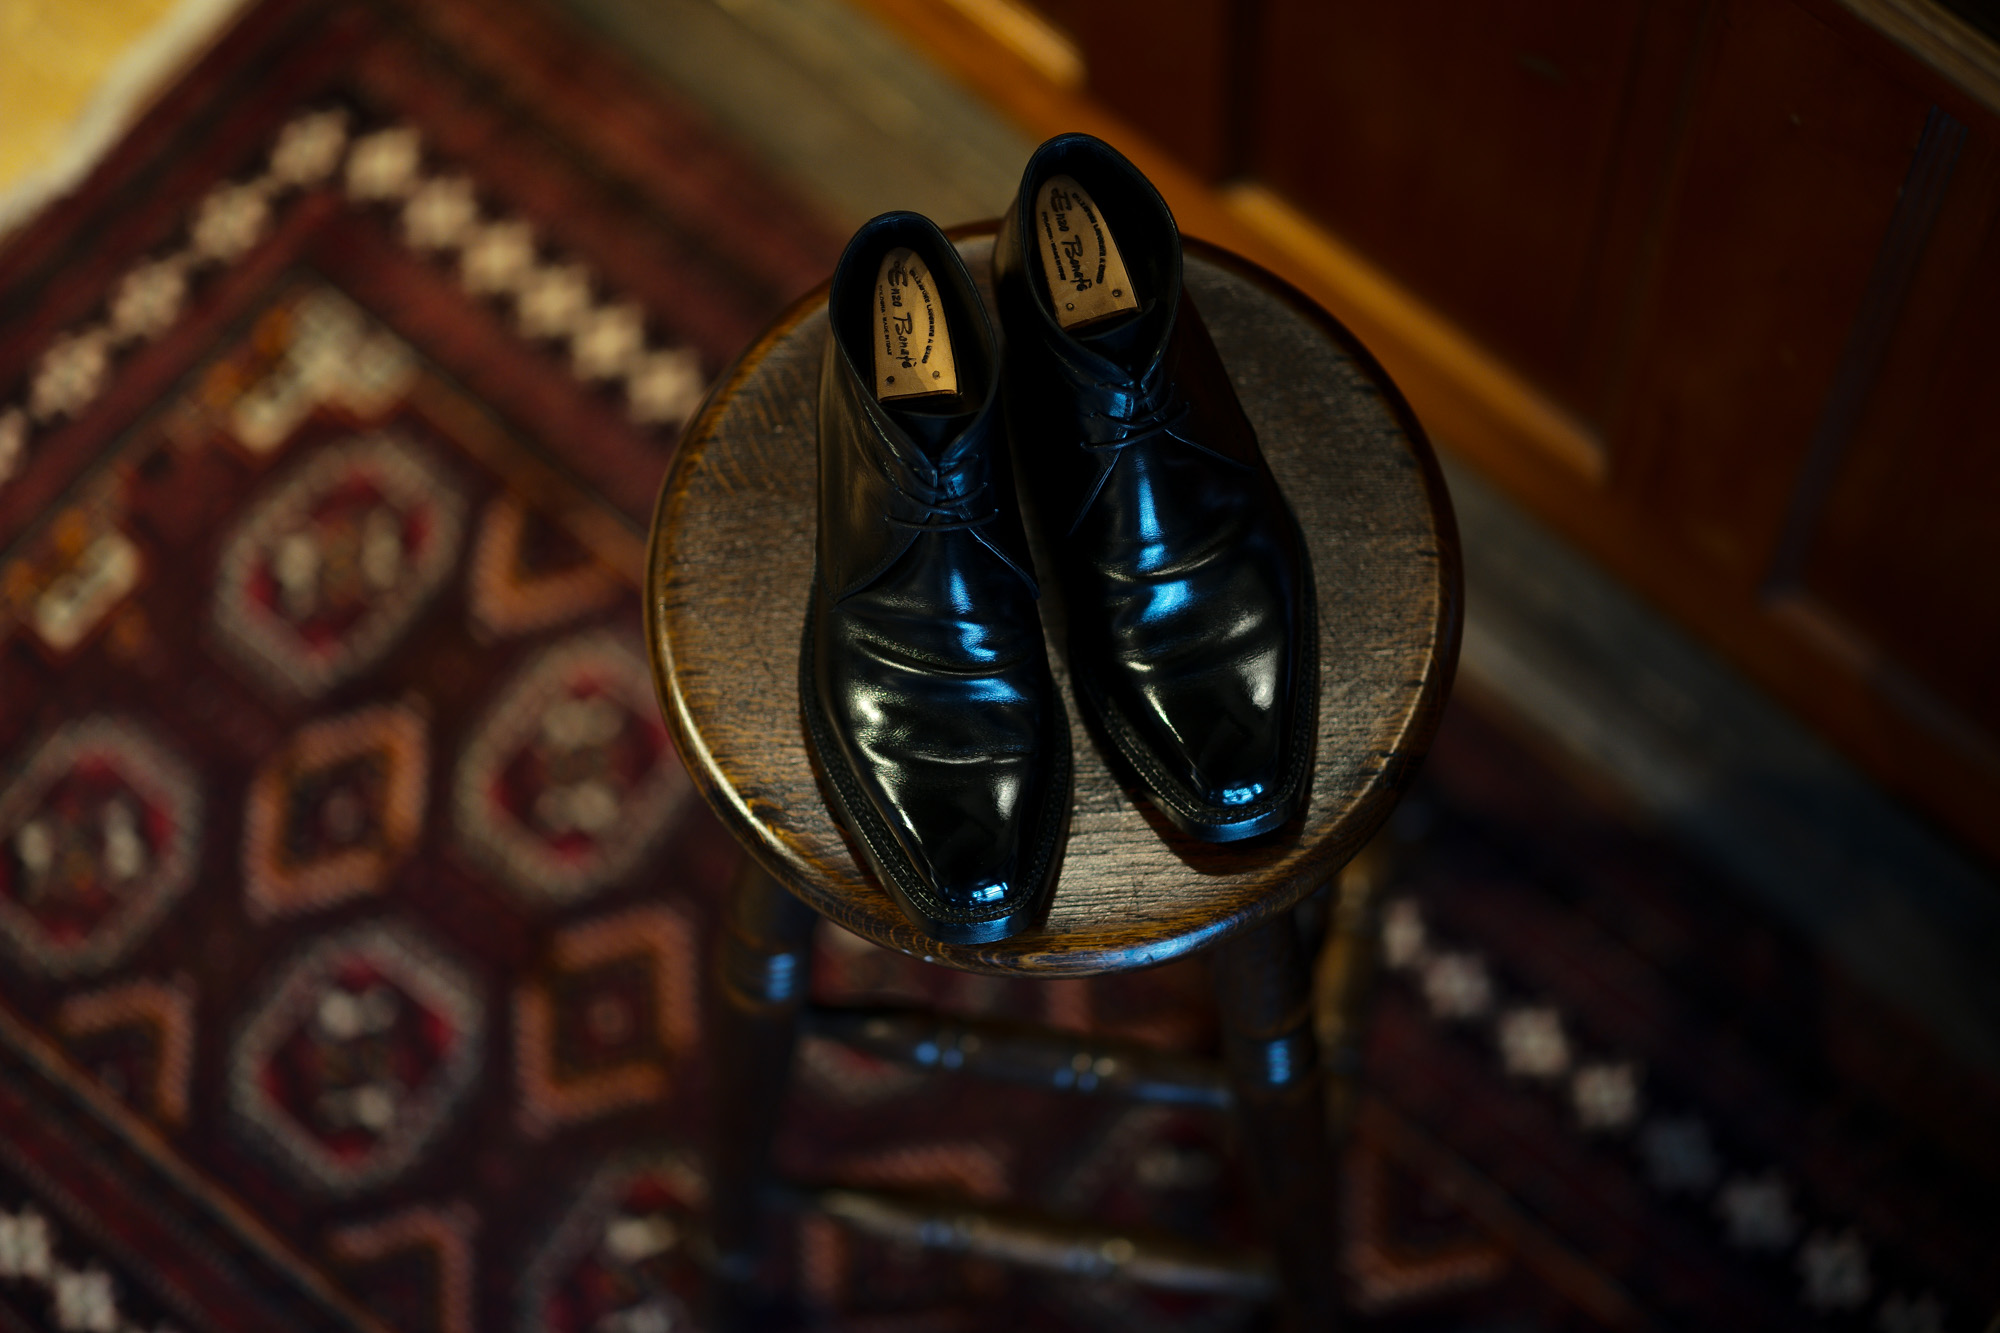 ENZO BONAFE ART.3722 Chukka boots Du Puy Vitello NERO 【My ART.3722】愛知 名古屋 Alto e Diritto altoediritto アルトエデリット エンツォボナフェ チャッカブーツ ボックスカーフ カーフレザー レザーブーツ ブラック 黒ブーツ